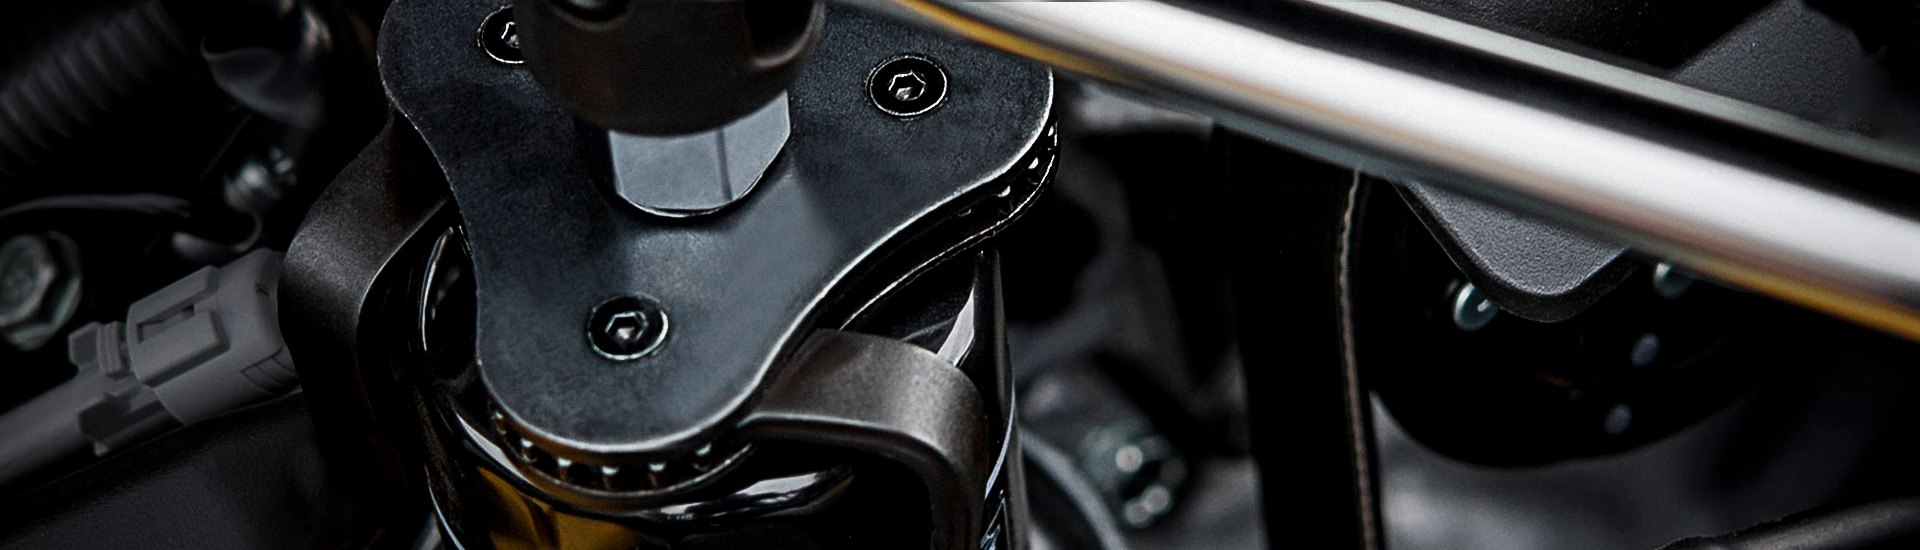 Oil Change Tools